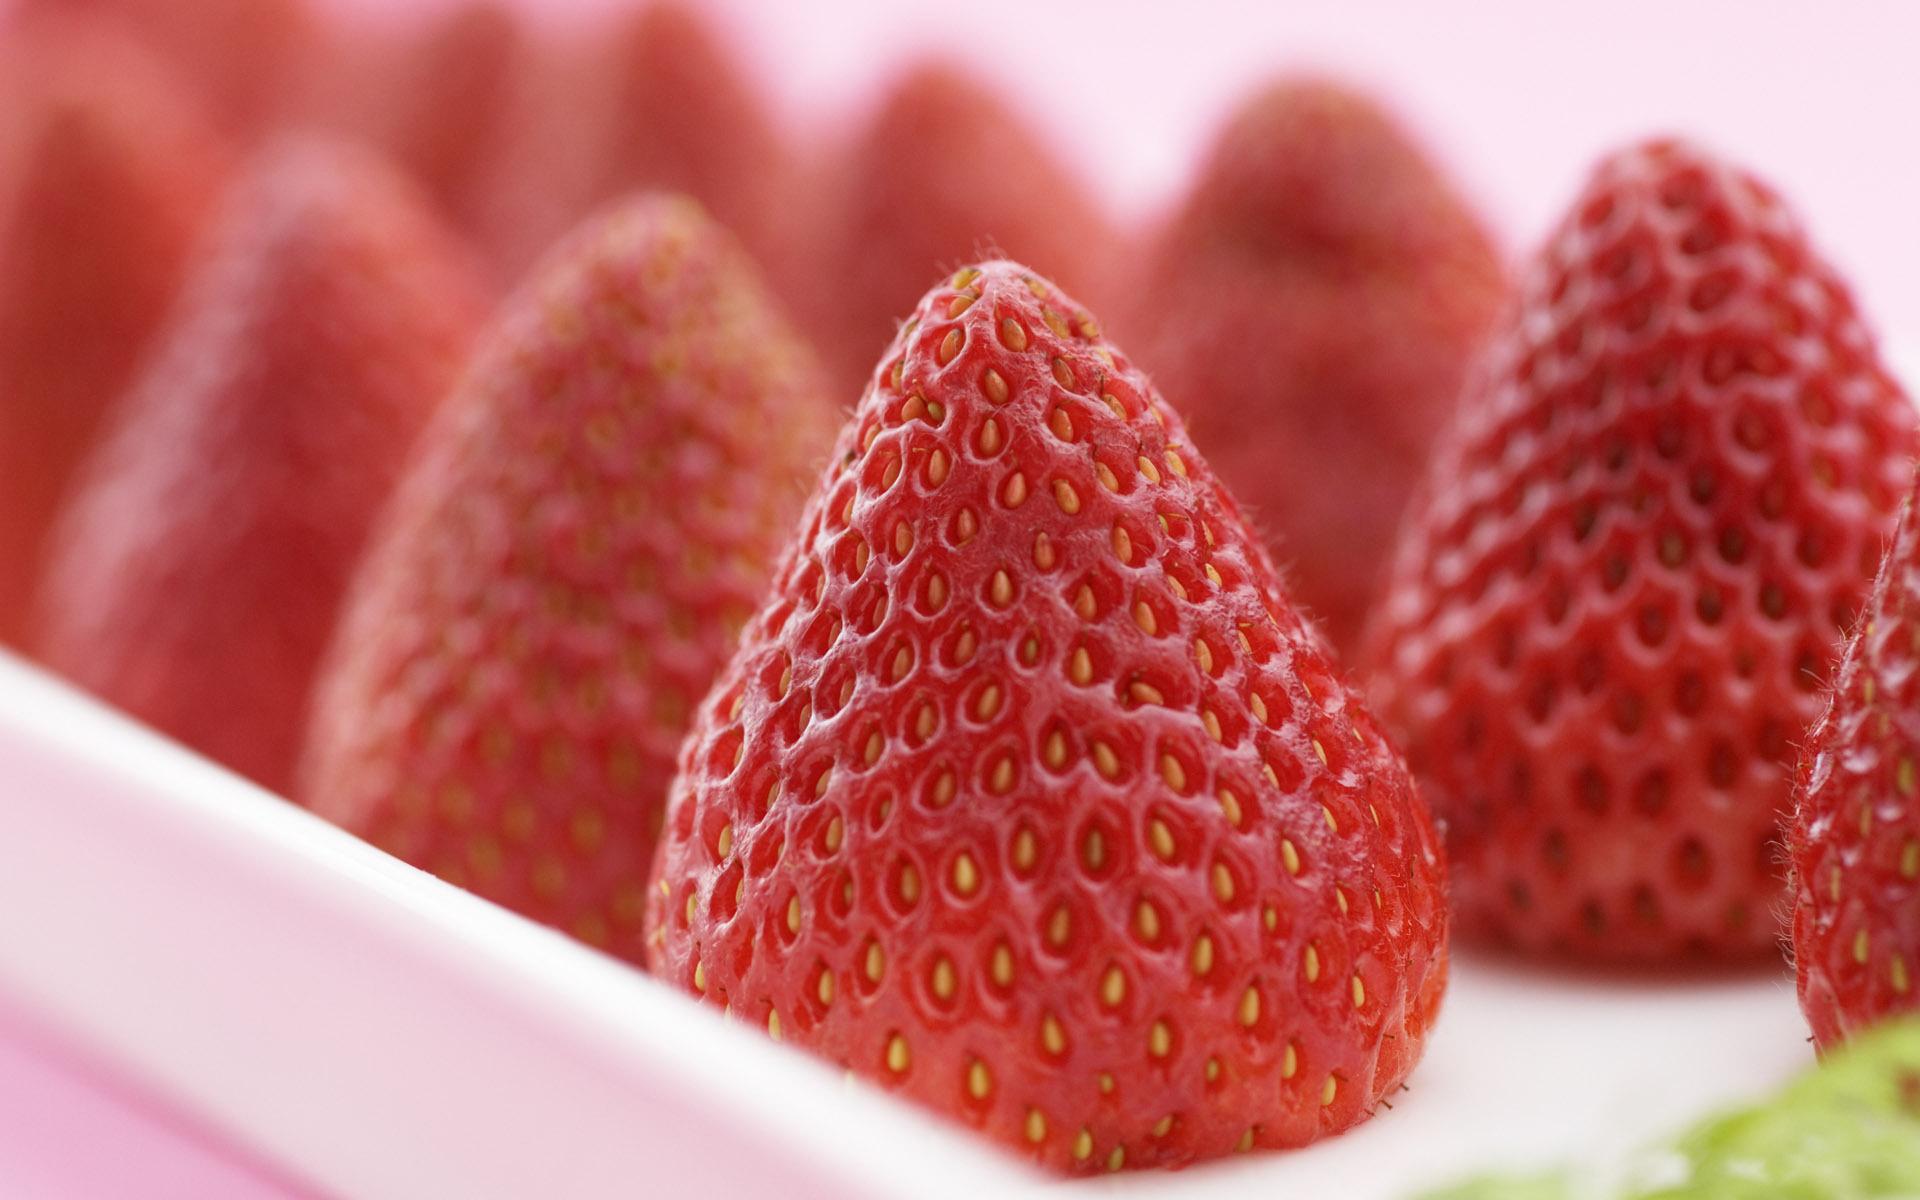 Strawberry Sweet Macro Pics Million Wallpapers Wallpaper Strawberry, food, berry, macro desktop wallpaper